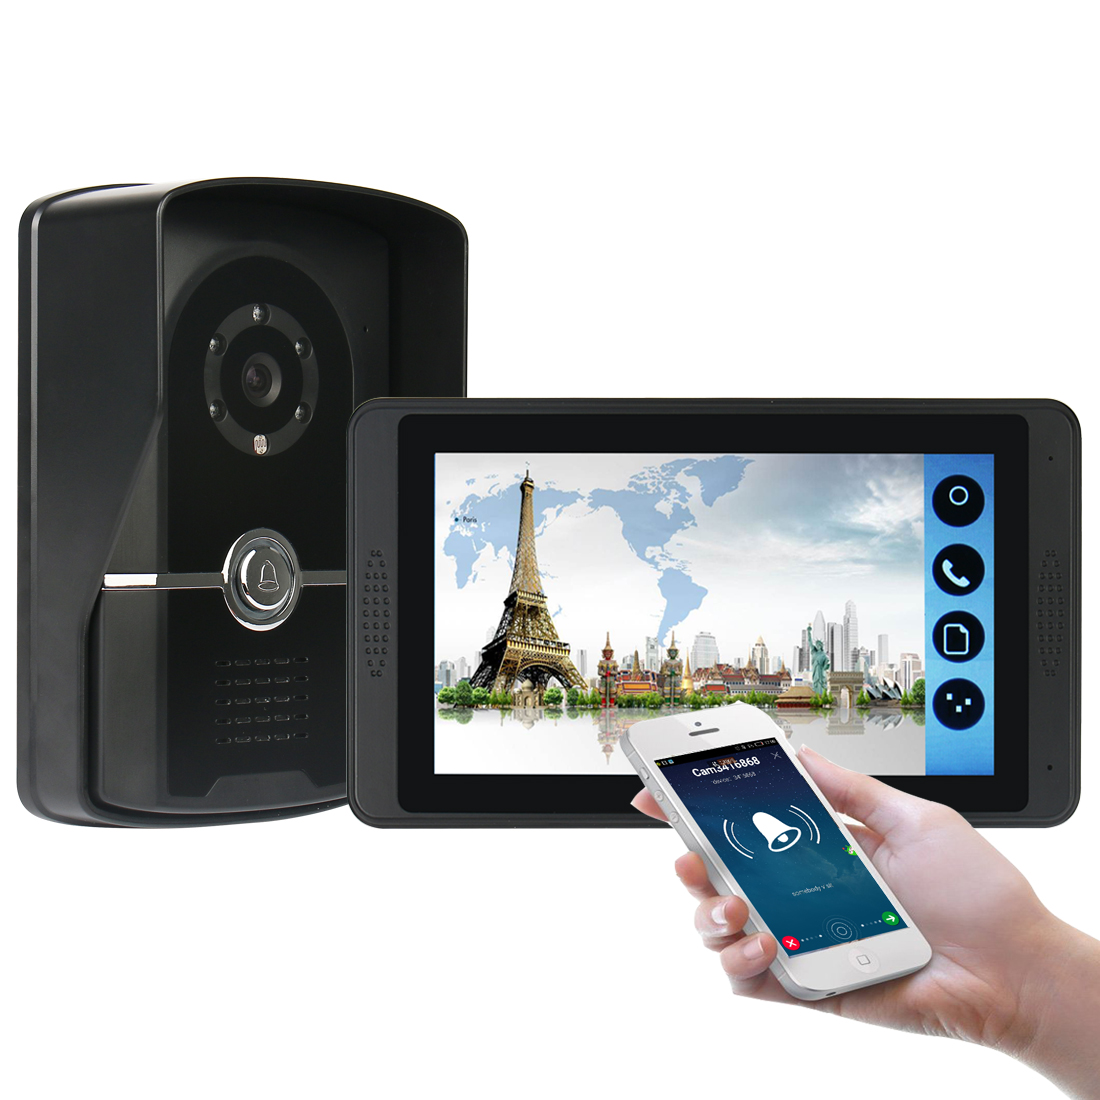 SmartYIBA Smart House Video Intercom One To One Video Doorphone 1000TVL Outdoor Camera With IR Lights Mobile APP Remote Unlock